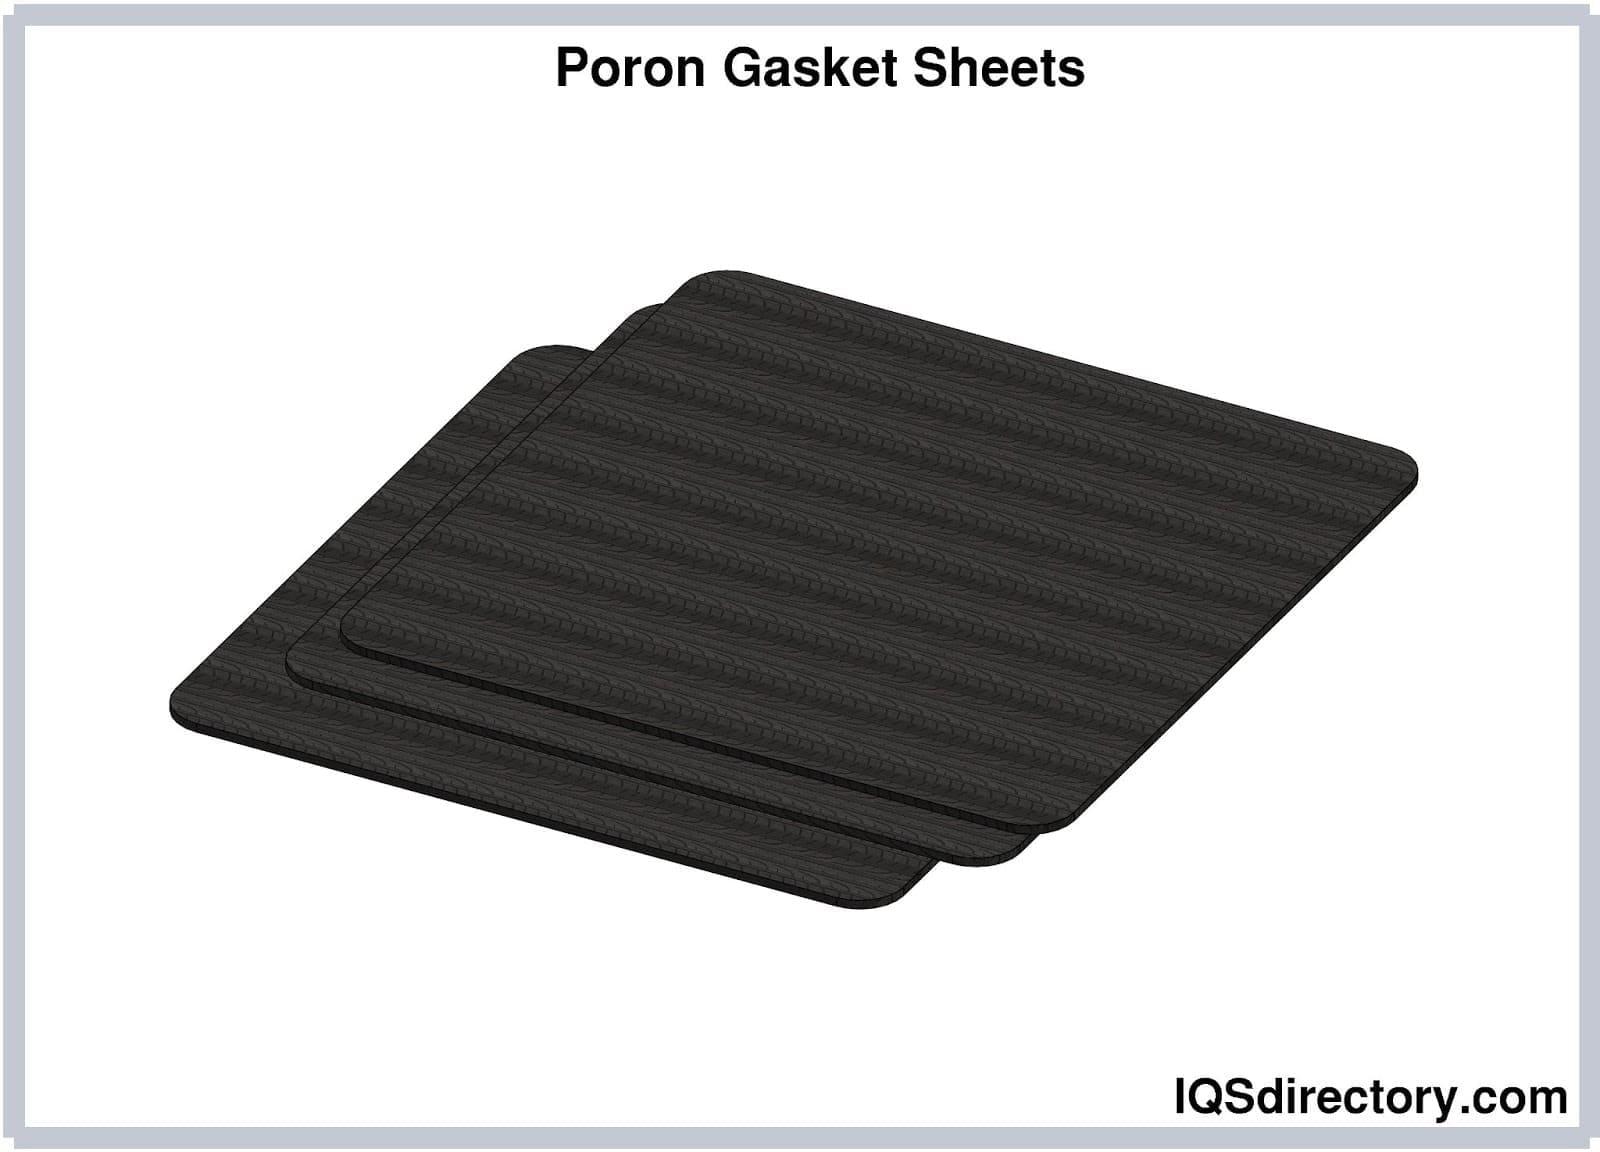 Poron Gasket Sheets